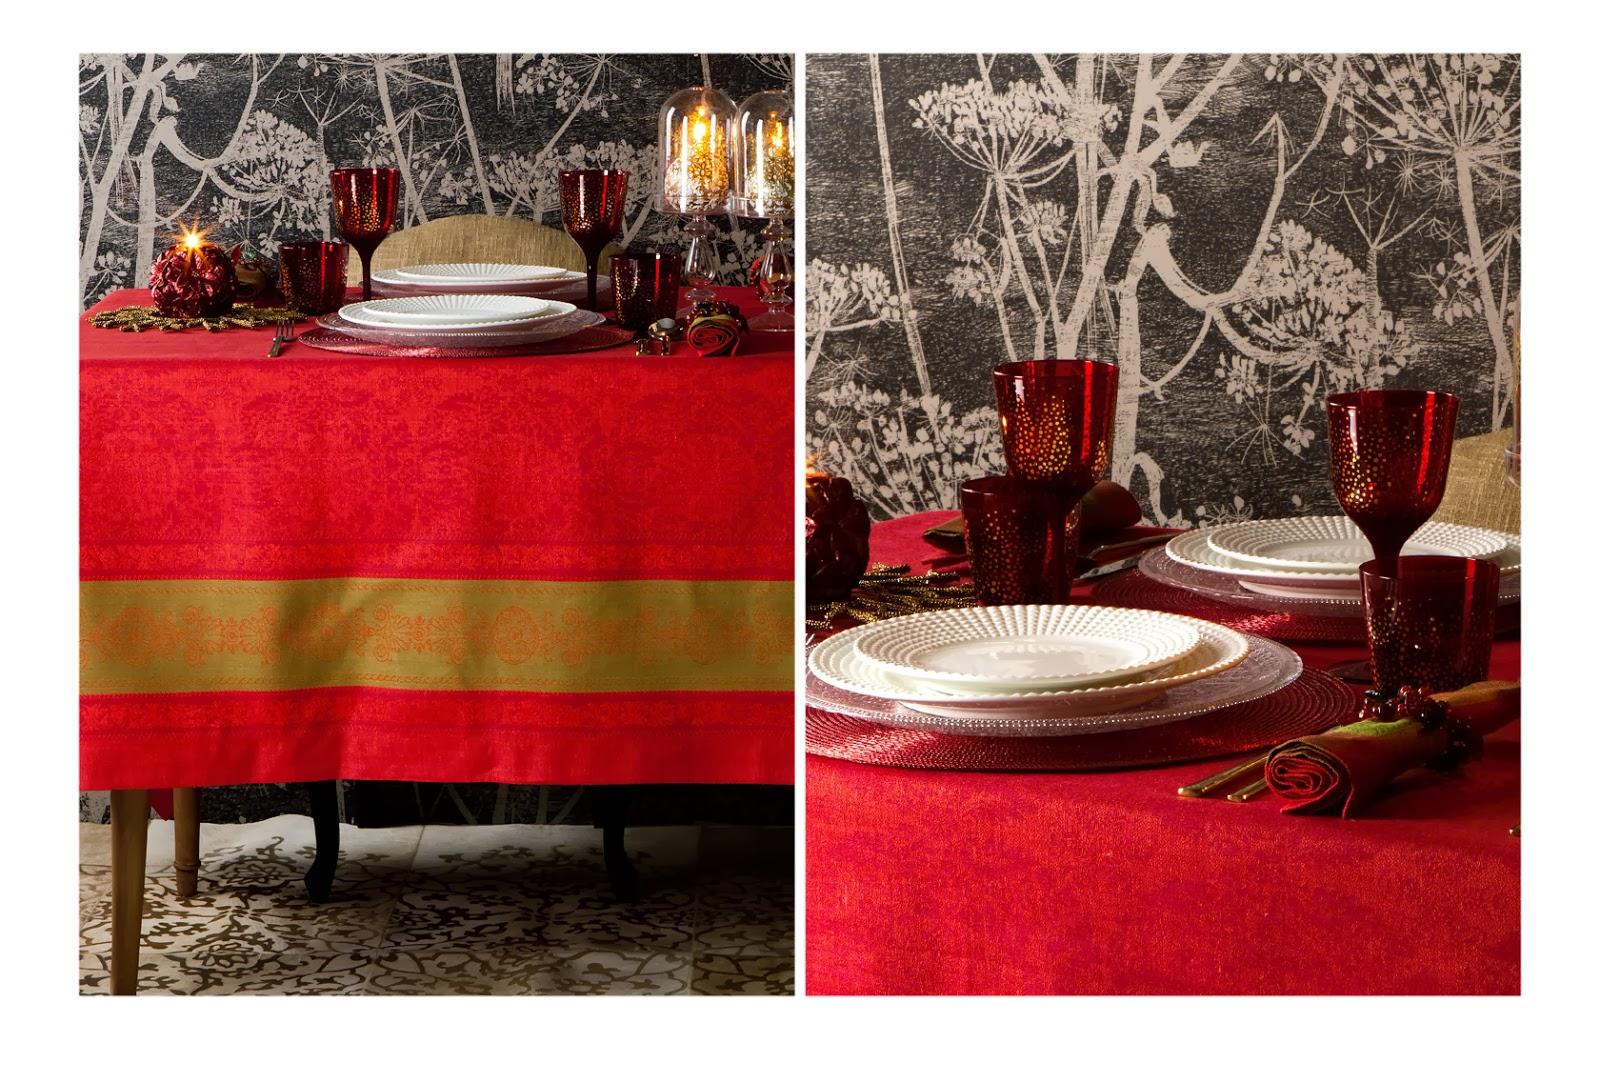 Home lifestyle especial de navidad zara home for Decoracion de mesa navidena